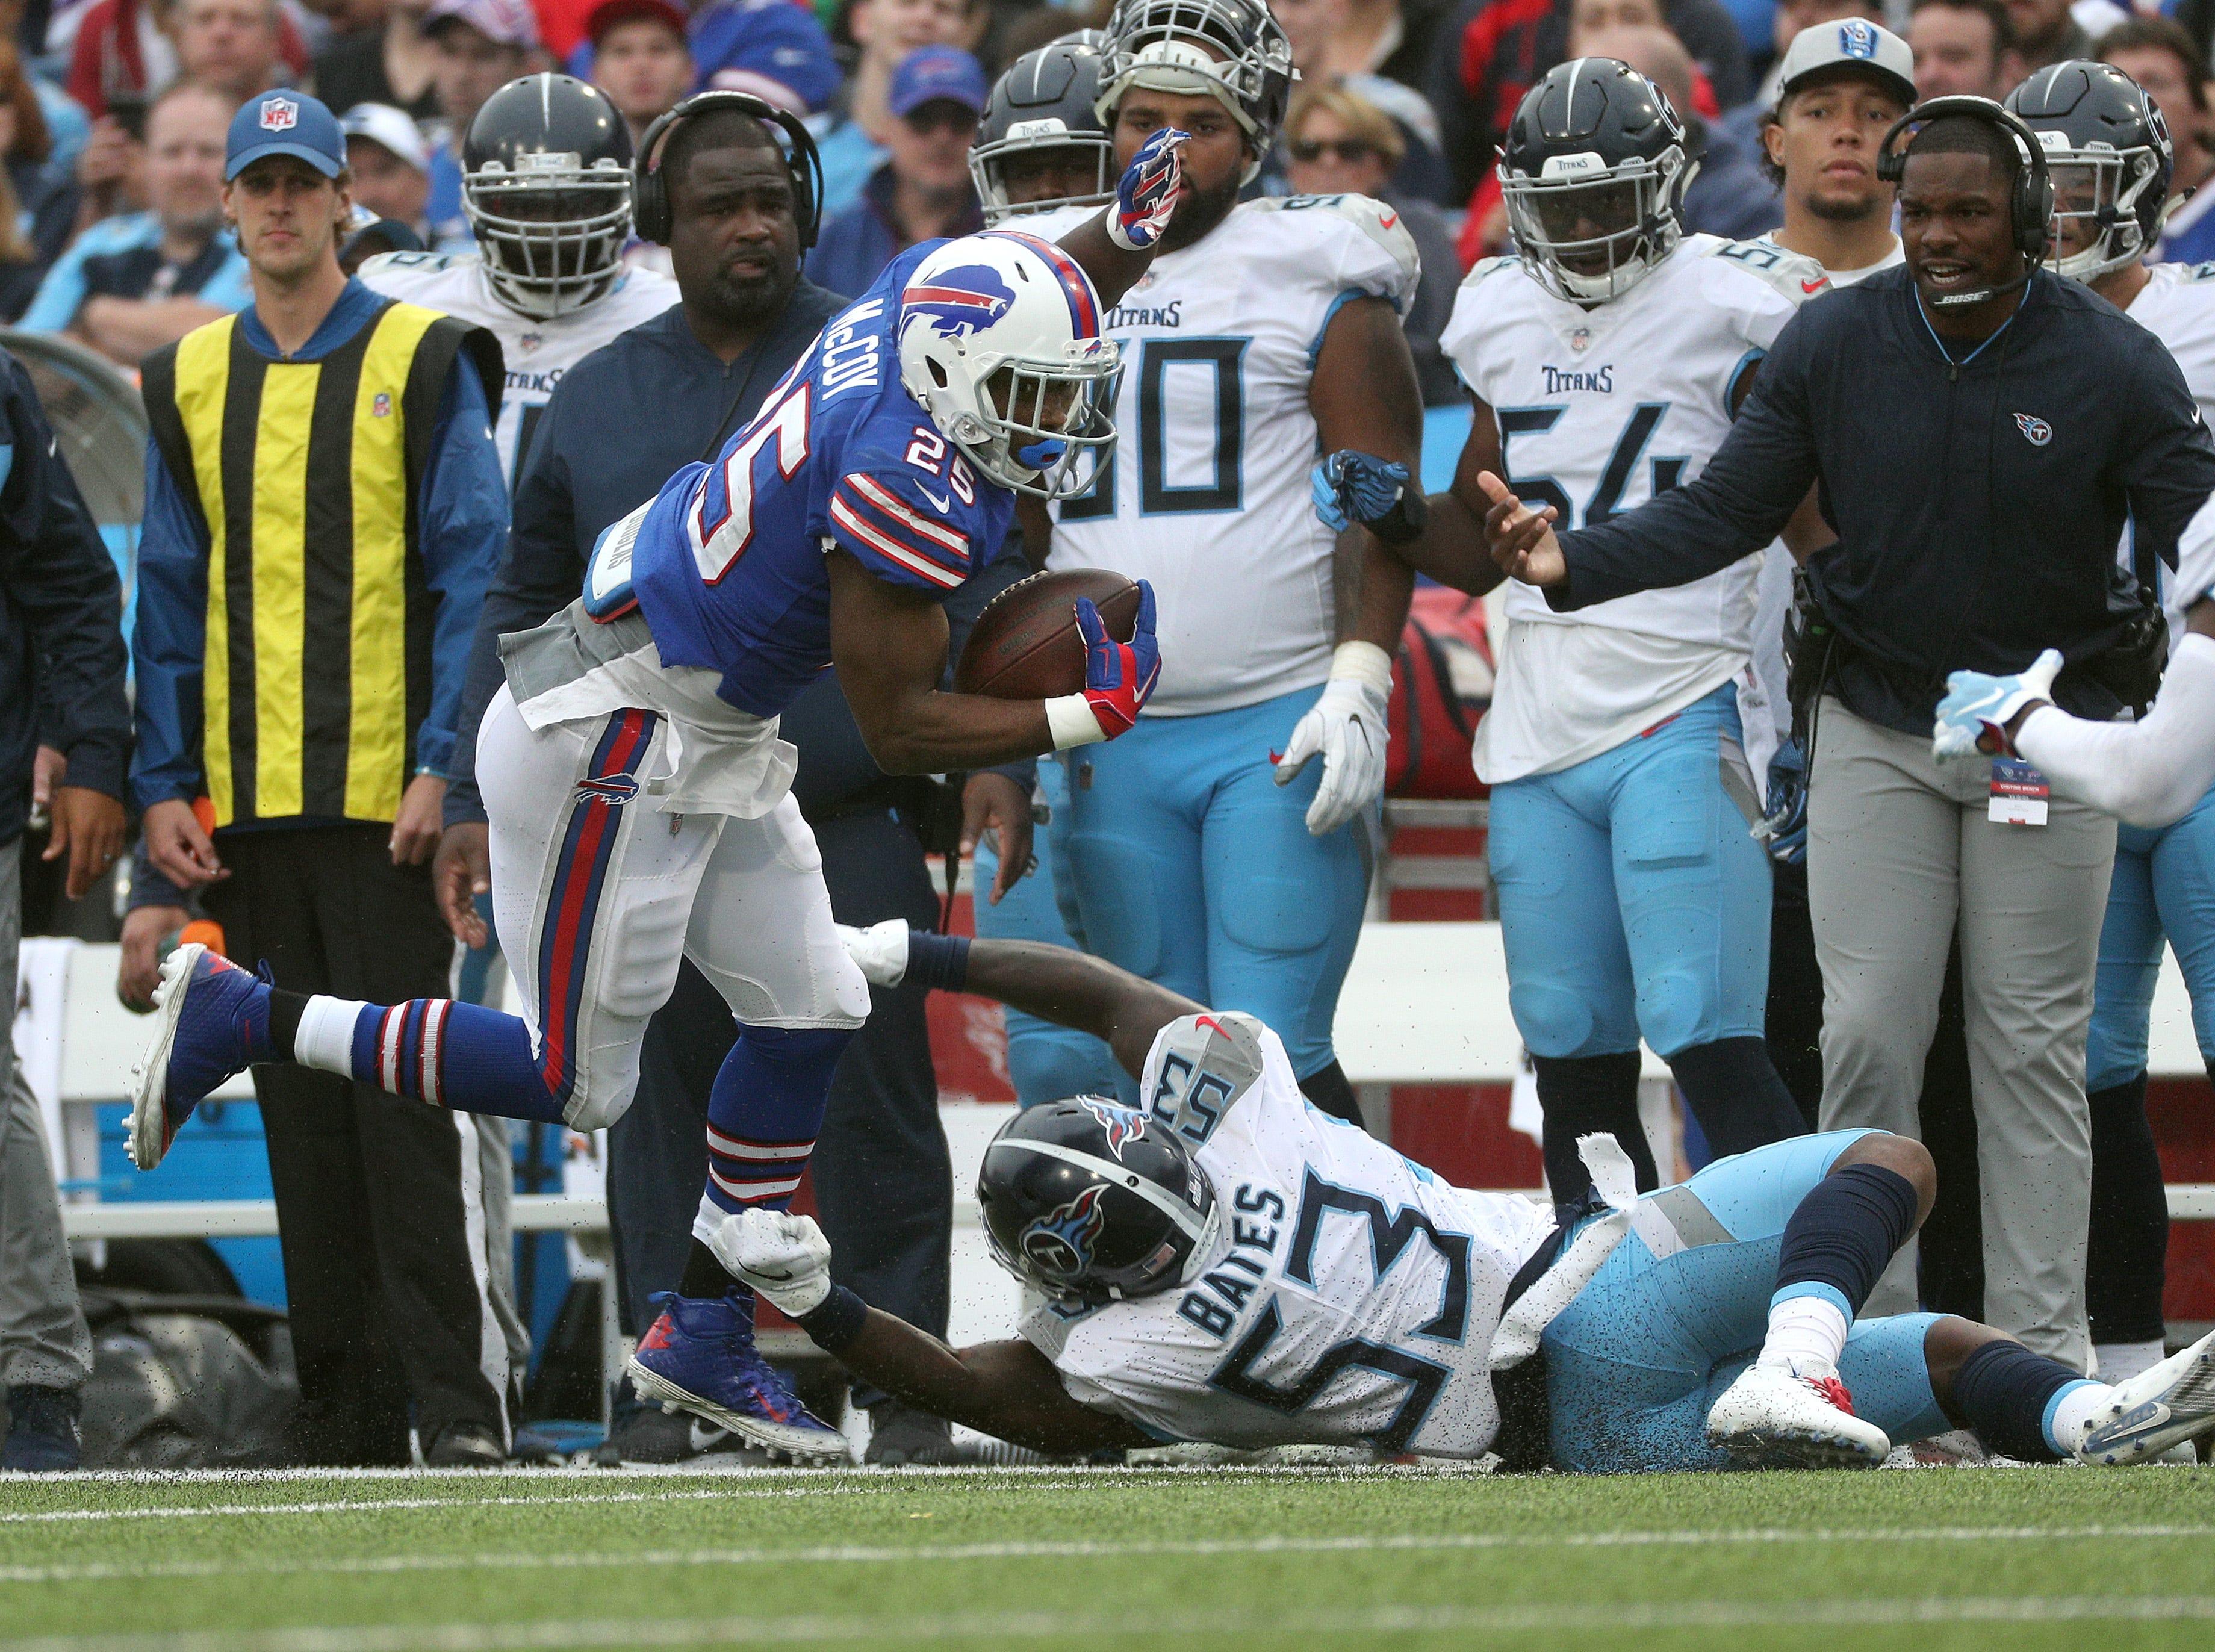 Bills running back LeSean McCoy slips a tackle by Titan's Daren Bates.